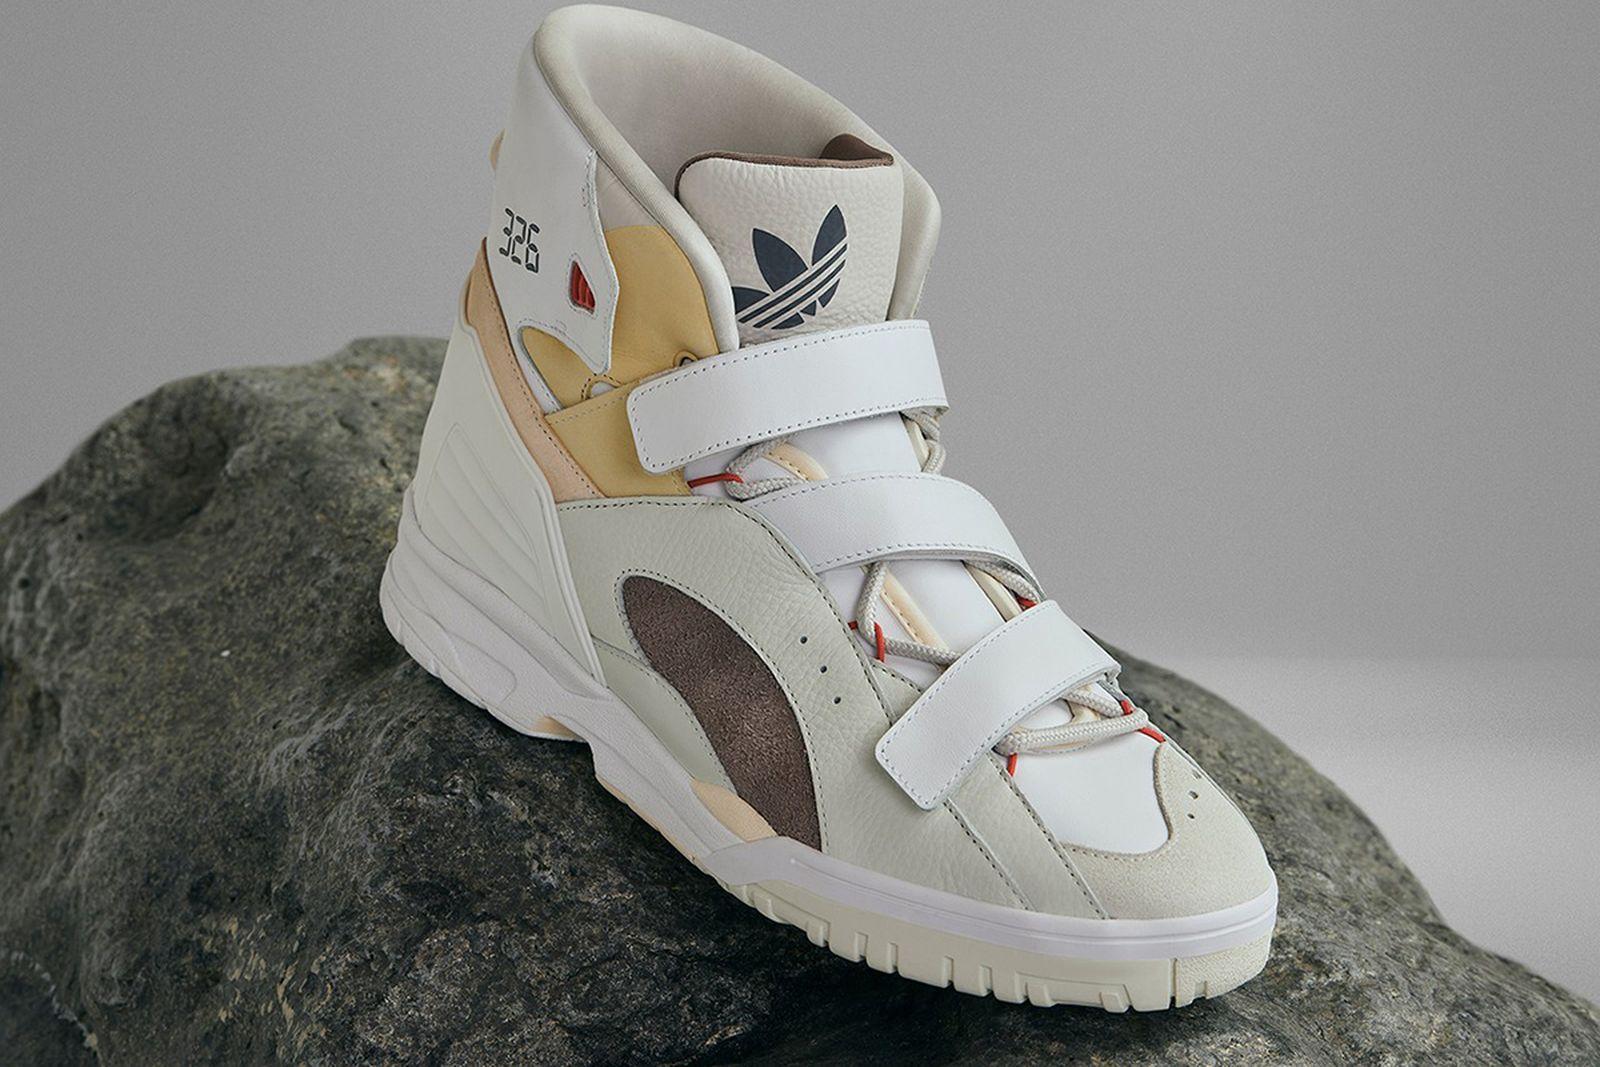 kid-cudi-adidas-vadawam-326-release-date-price-08